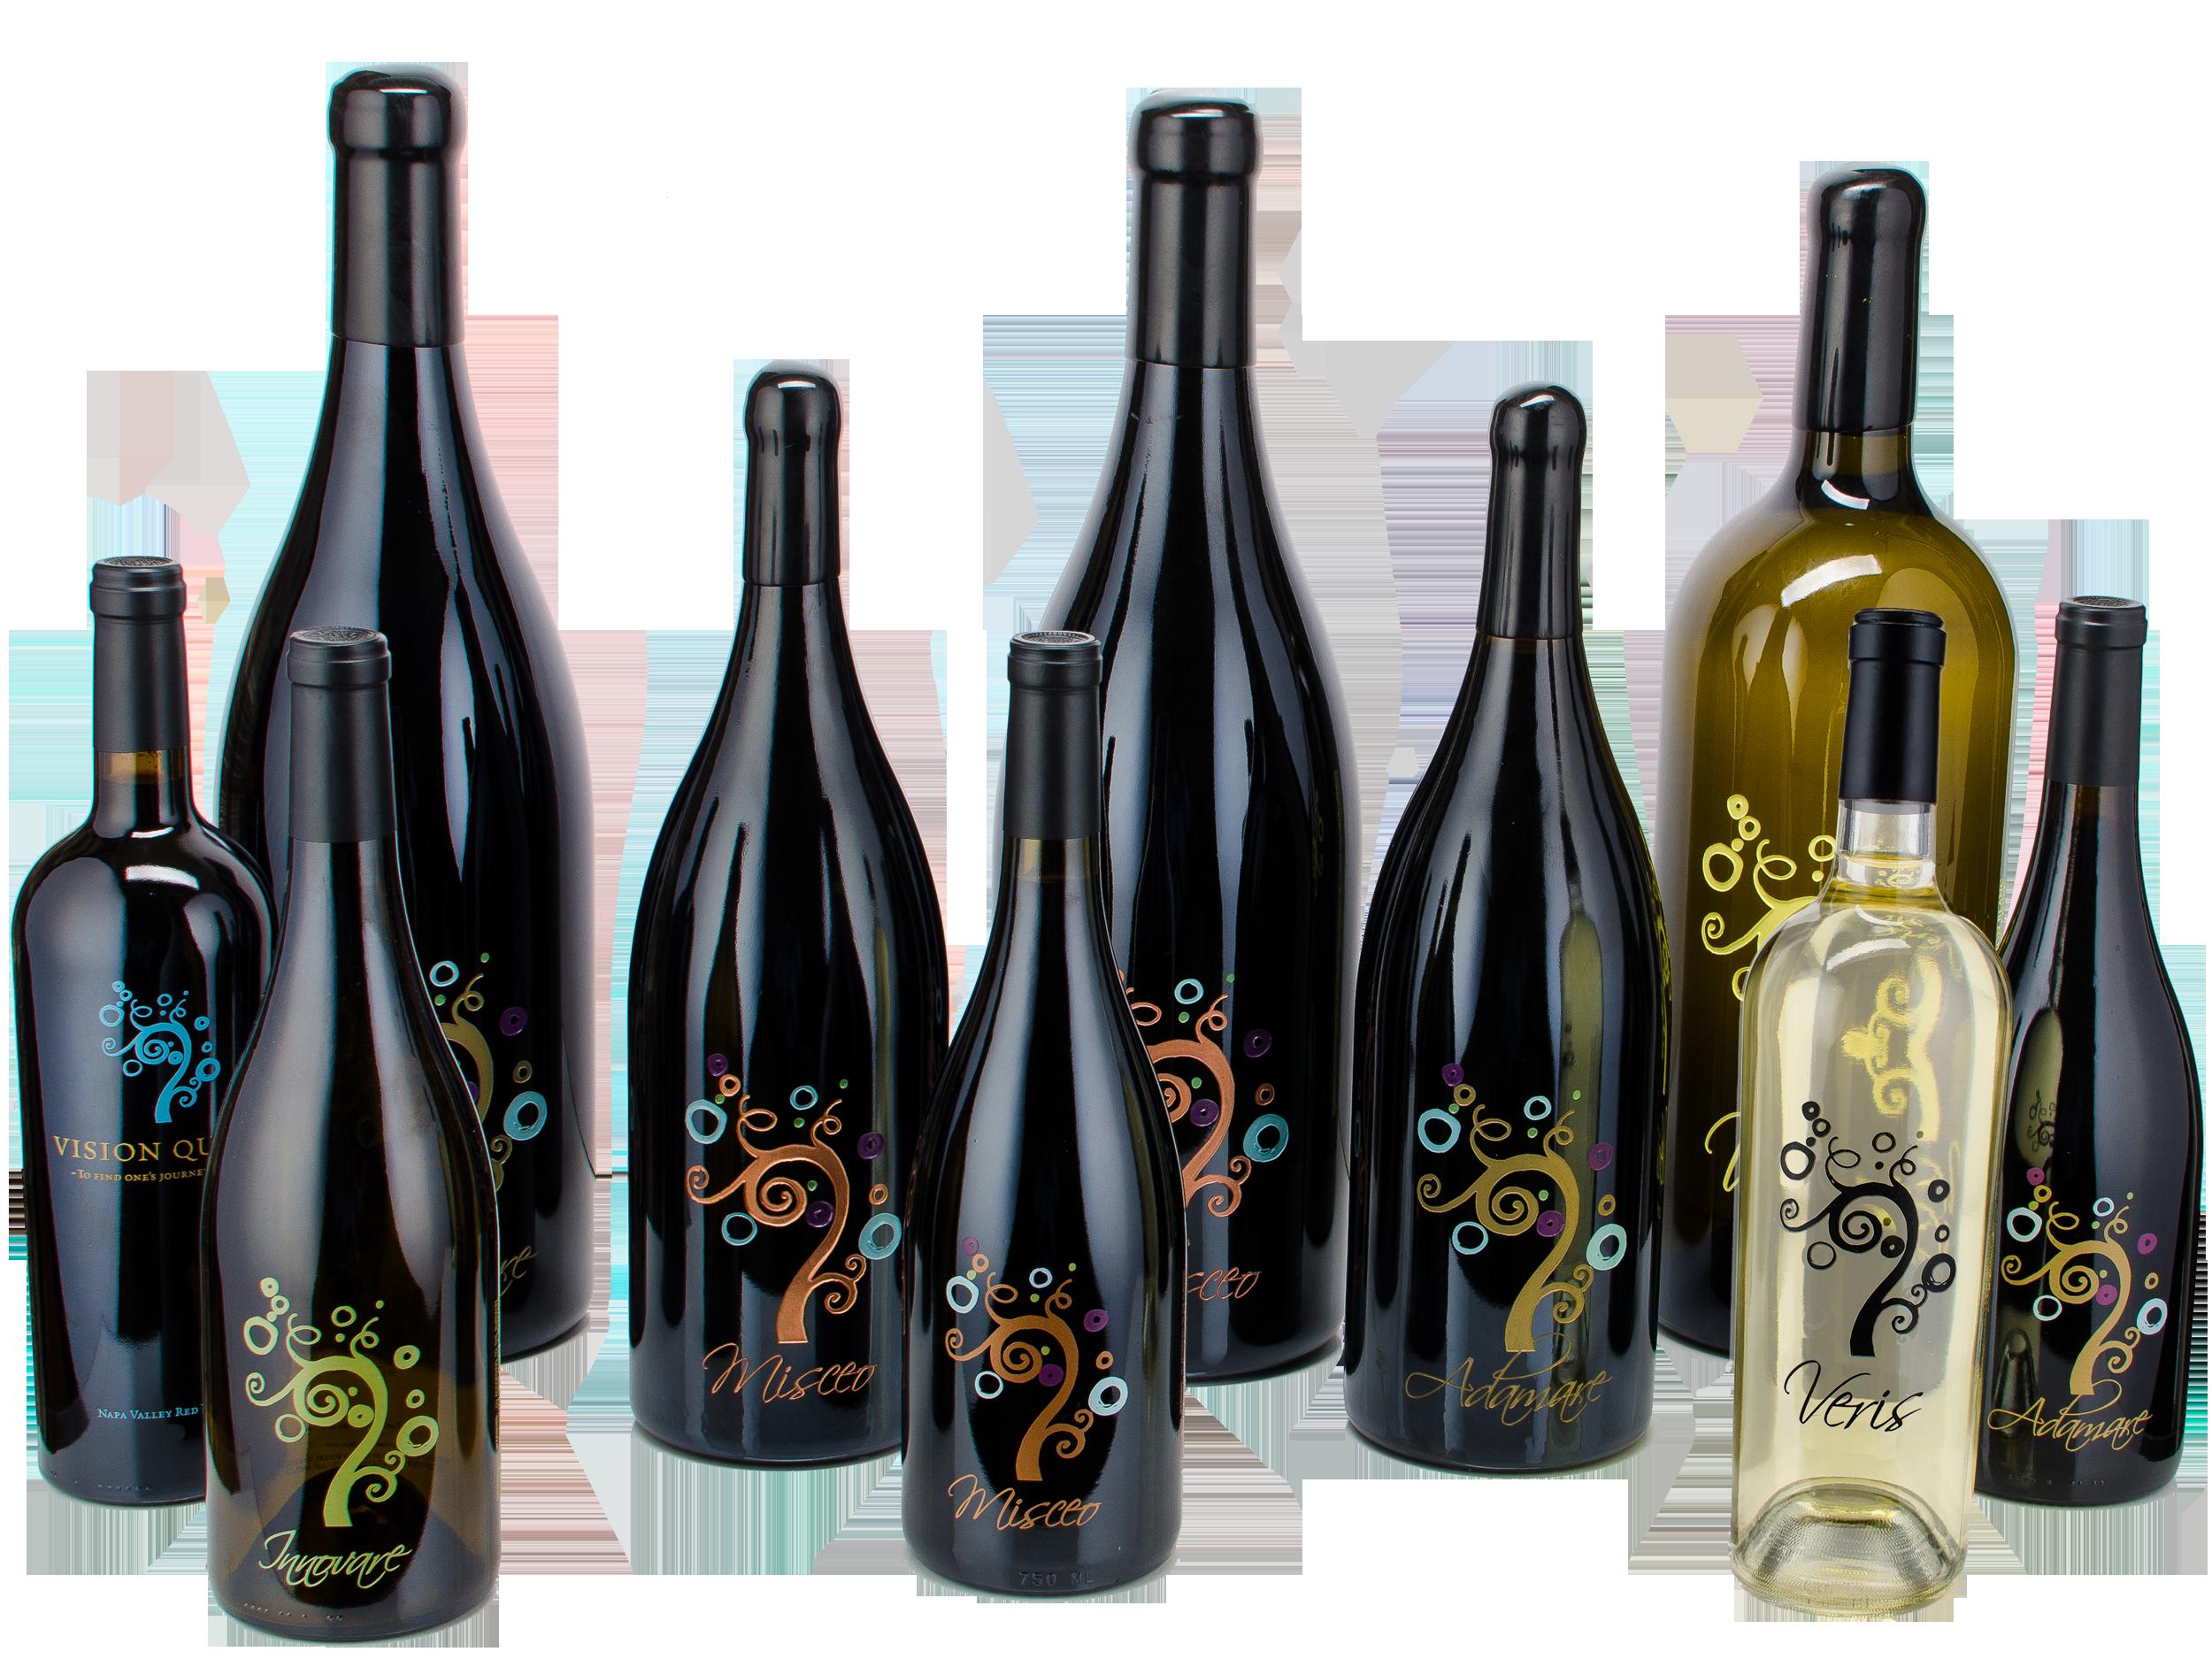 hugo wine collection.jpg